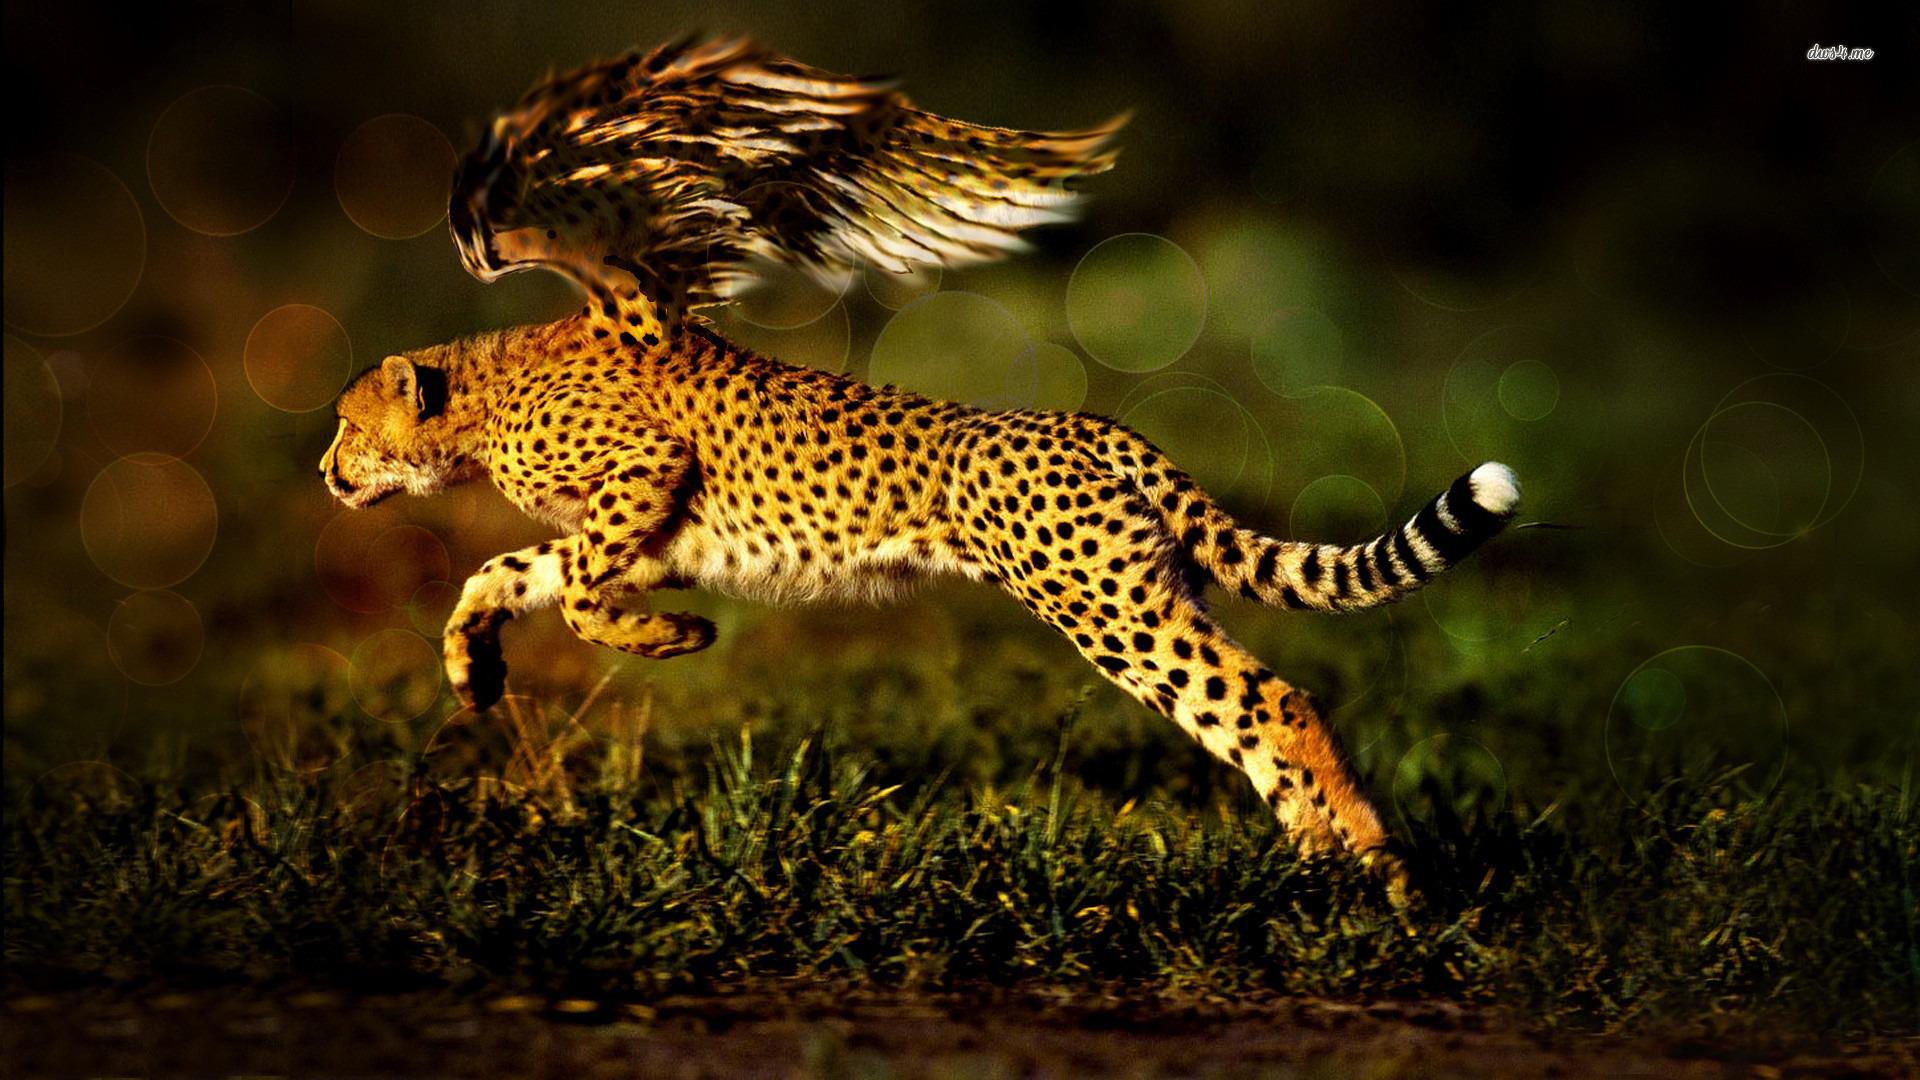 3 cheetah hd wallpapers backgrounds wallpaper abyss